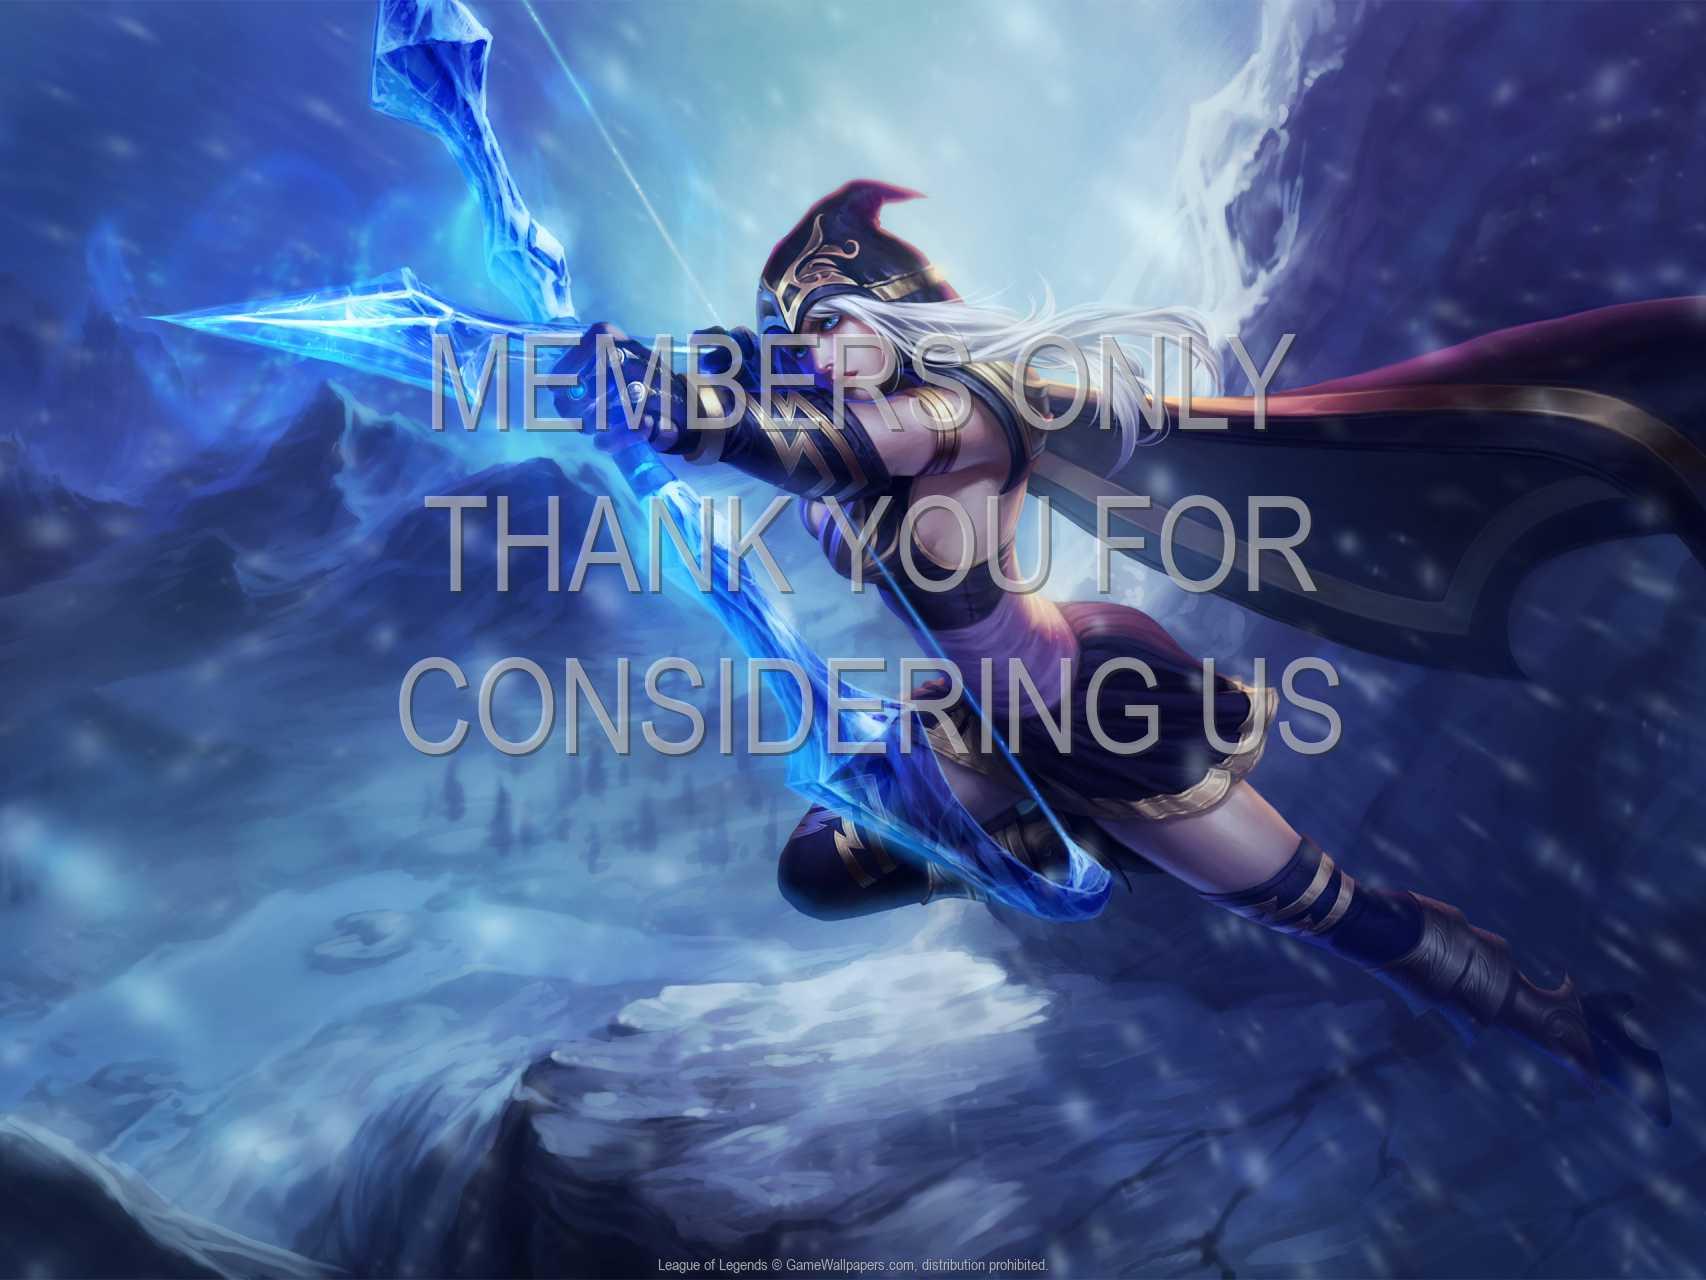 League of Legends 720p Horizontal Handy Hintergrundbild 31